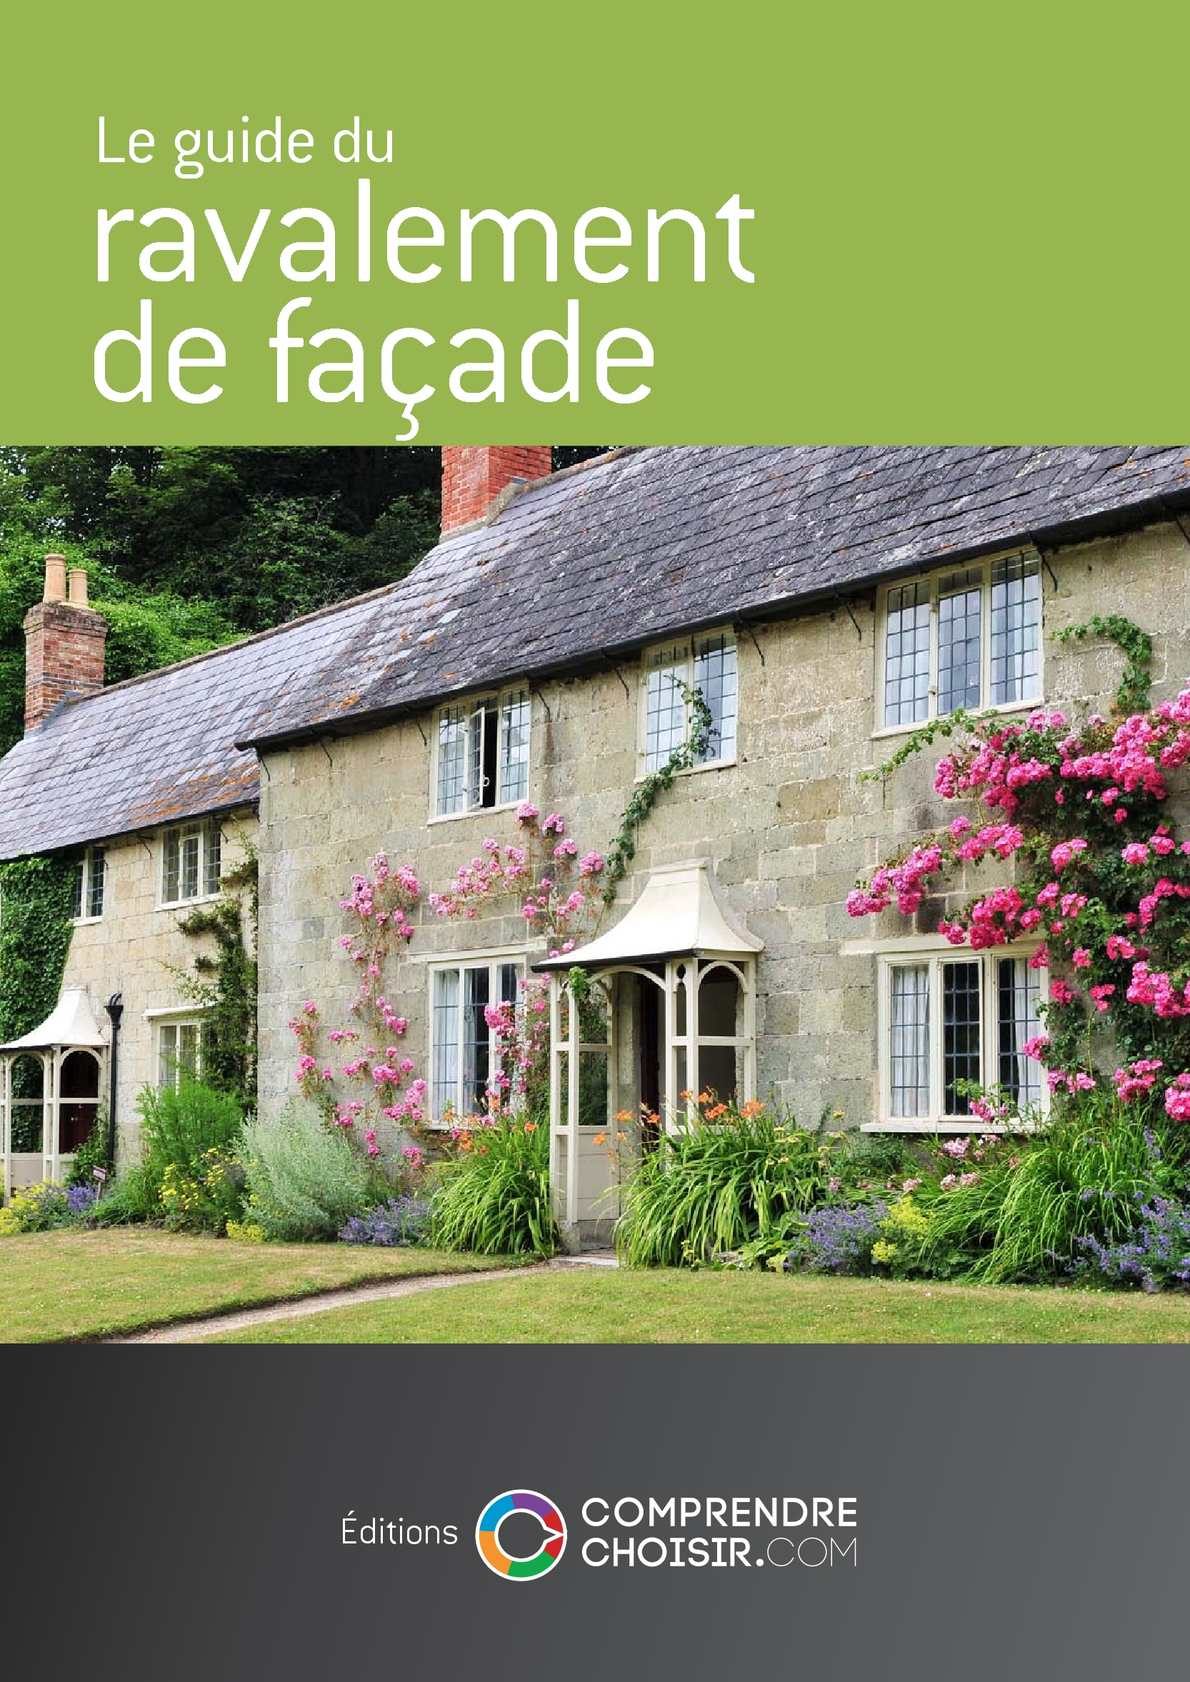 calam o comprendrechoisir le guide du ravalement de facade. Black Bedroom Furniture Sets. Home Design Ideas